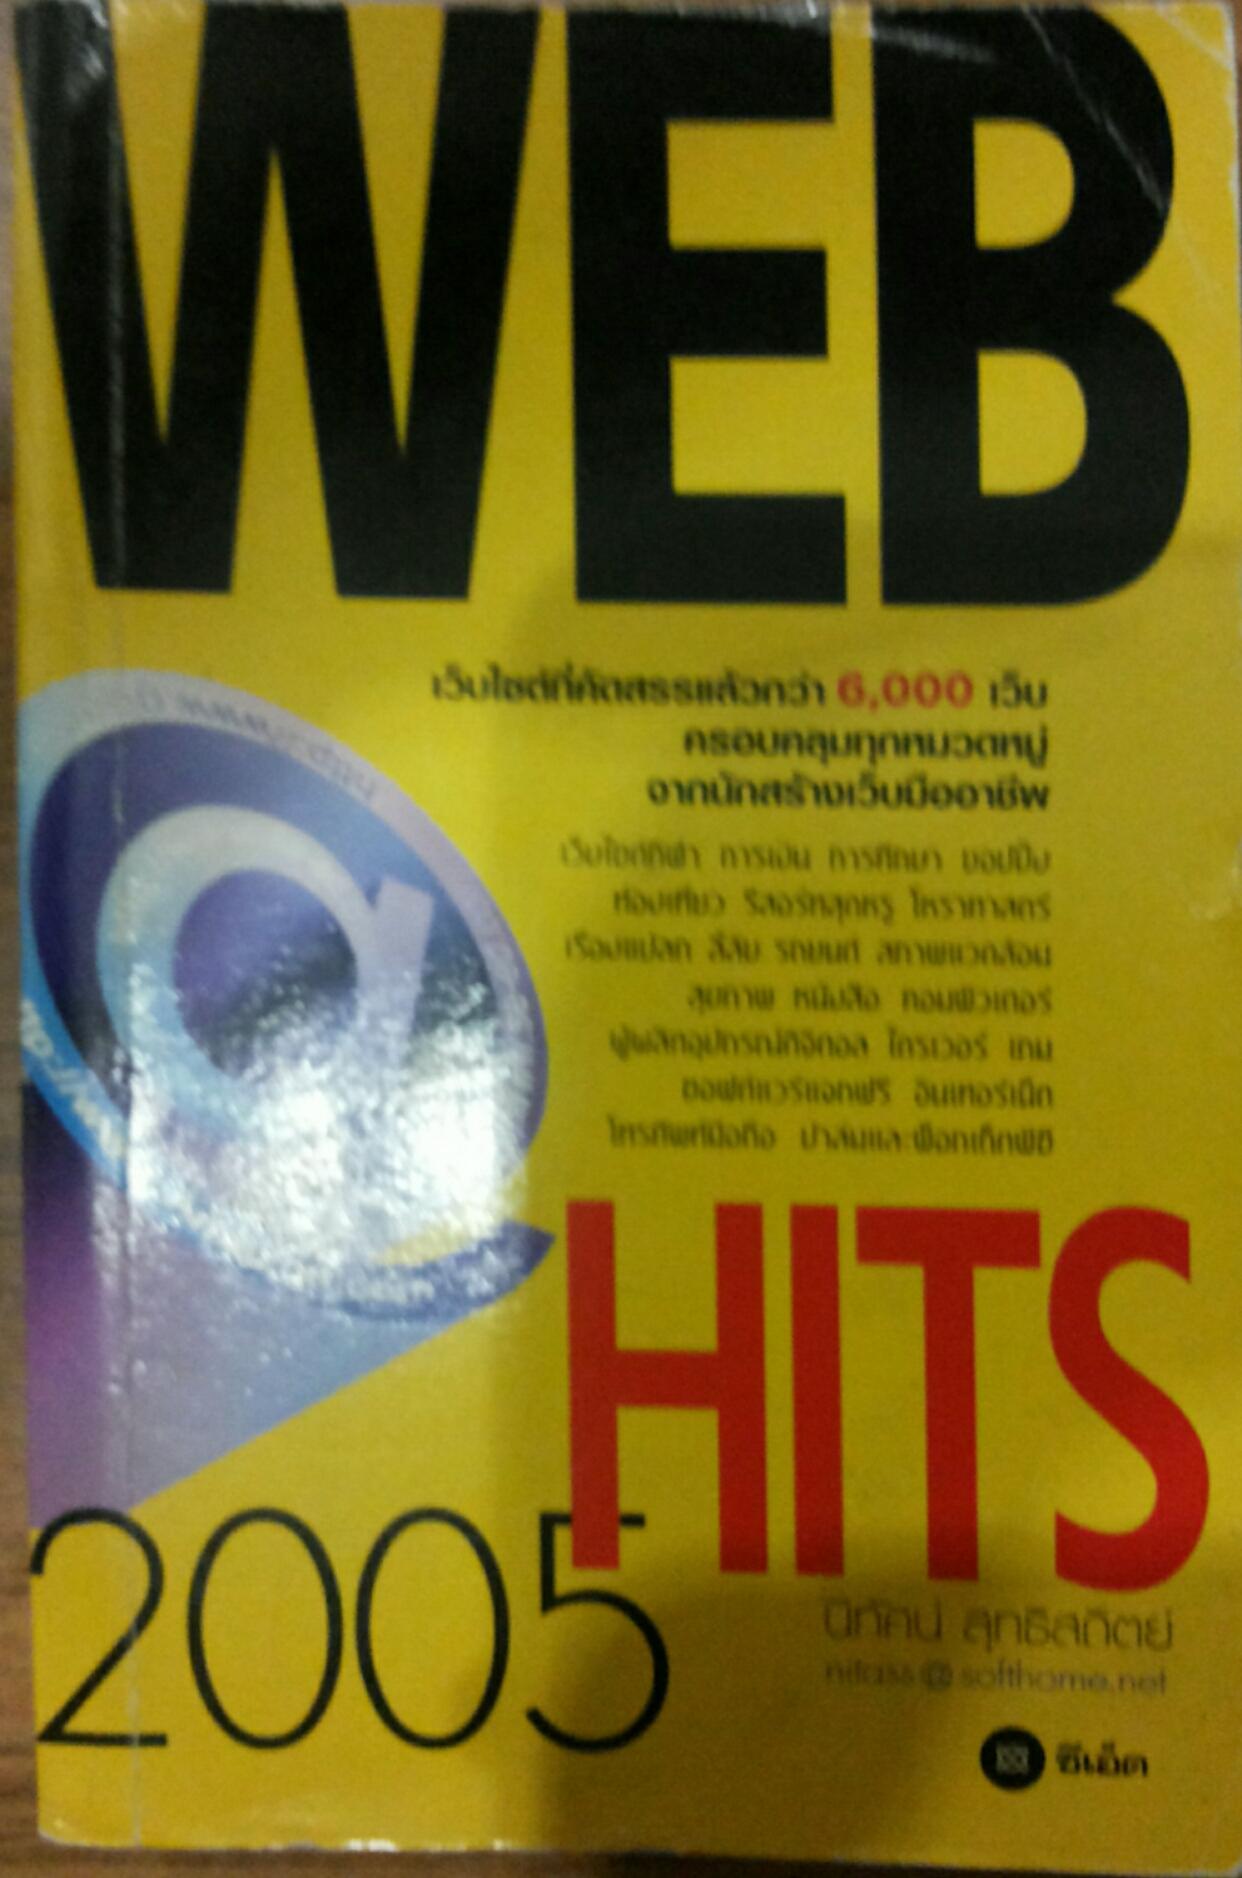 WEB HITS 2005